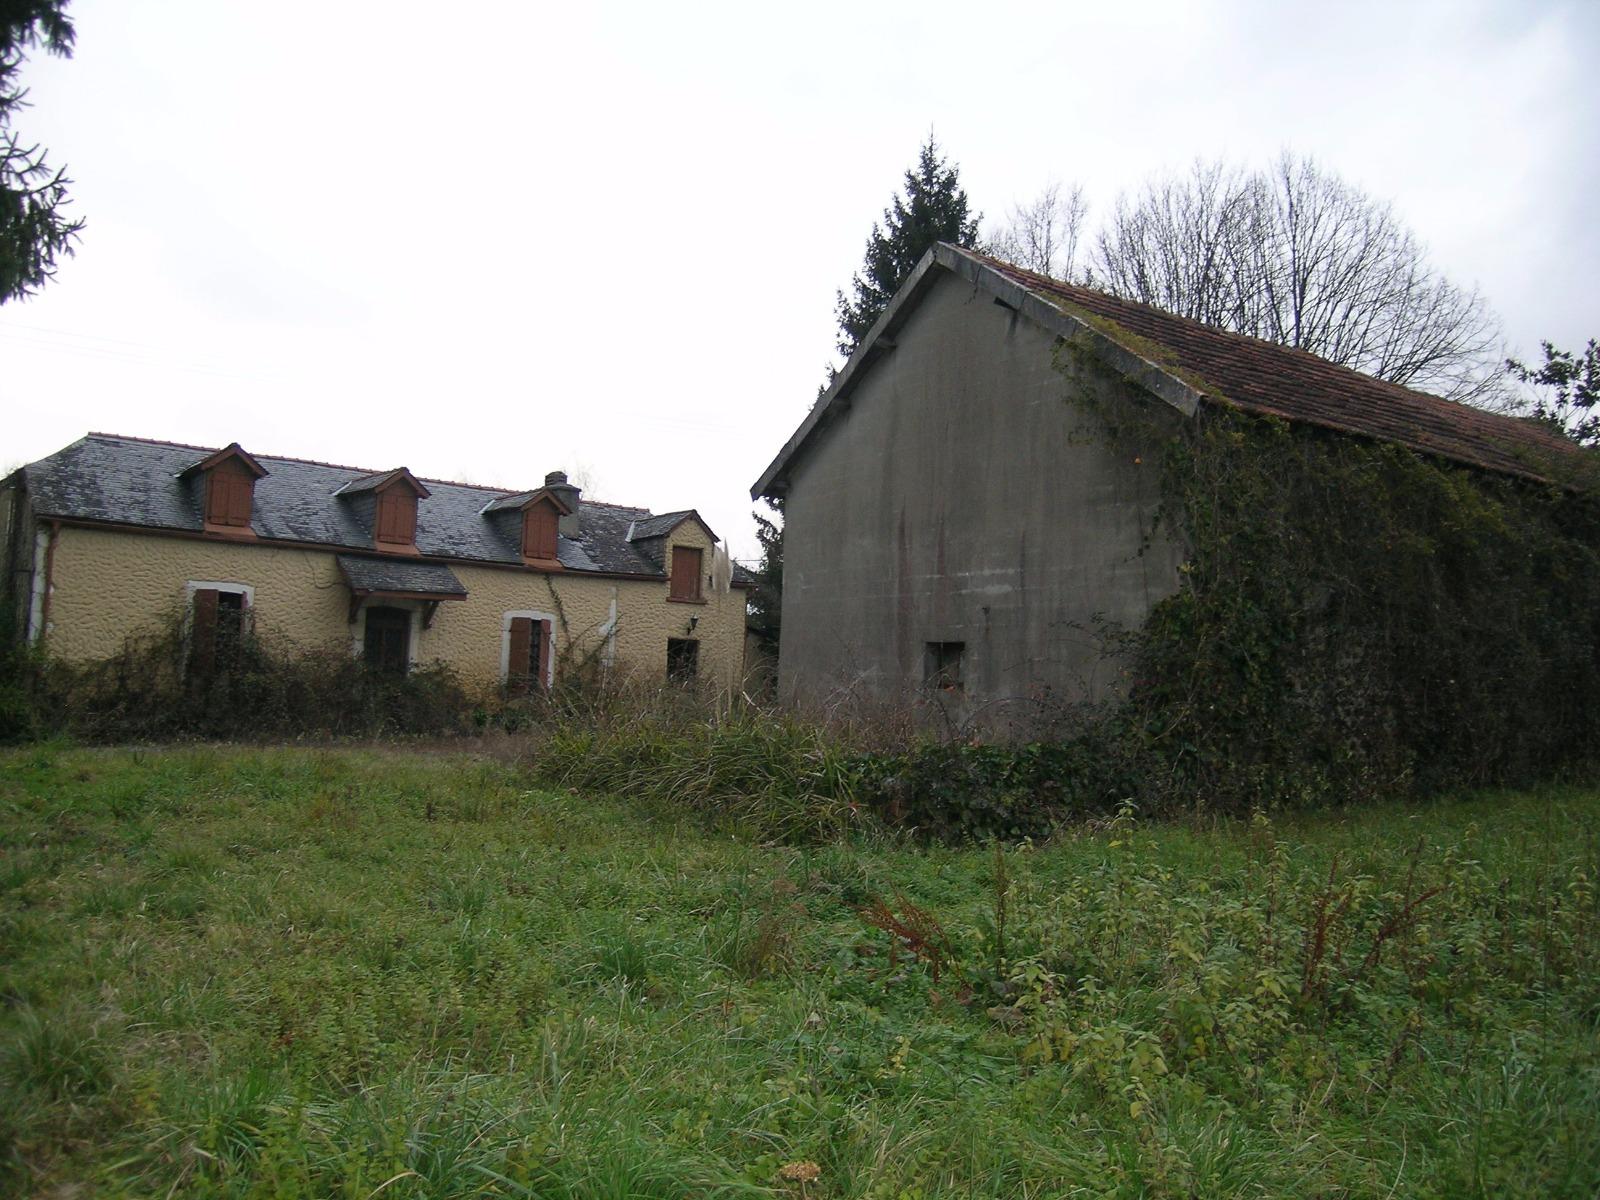 Secteur morlaas vendre maison r nover avec grange - Agence tcl grange blanche horaire ...